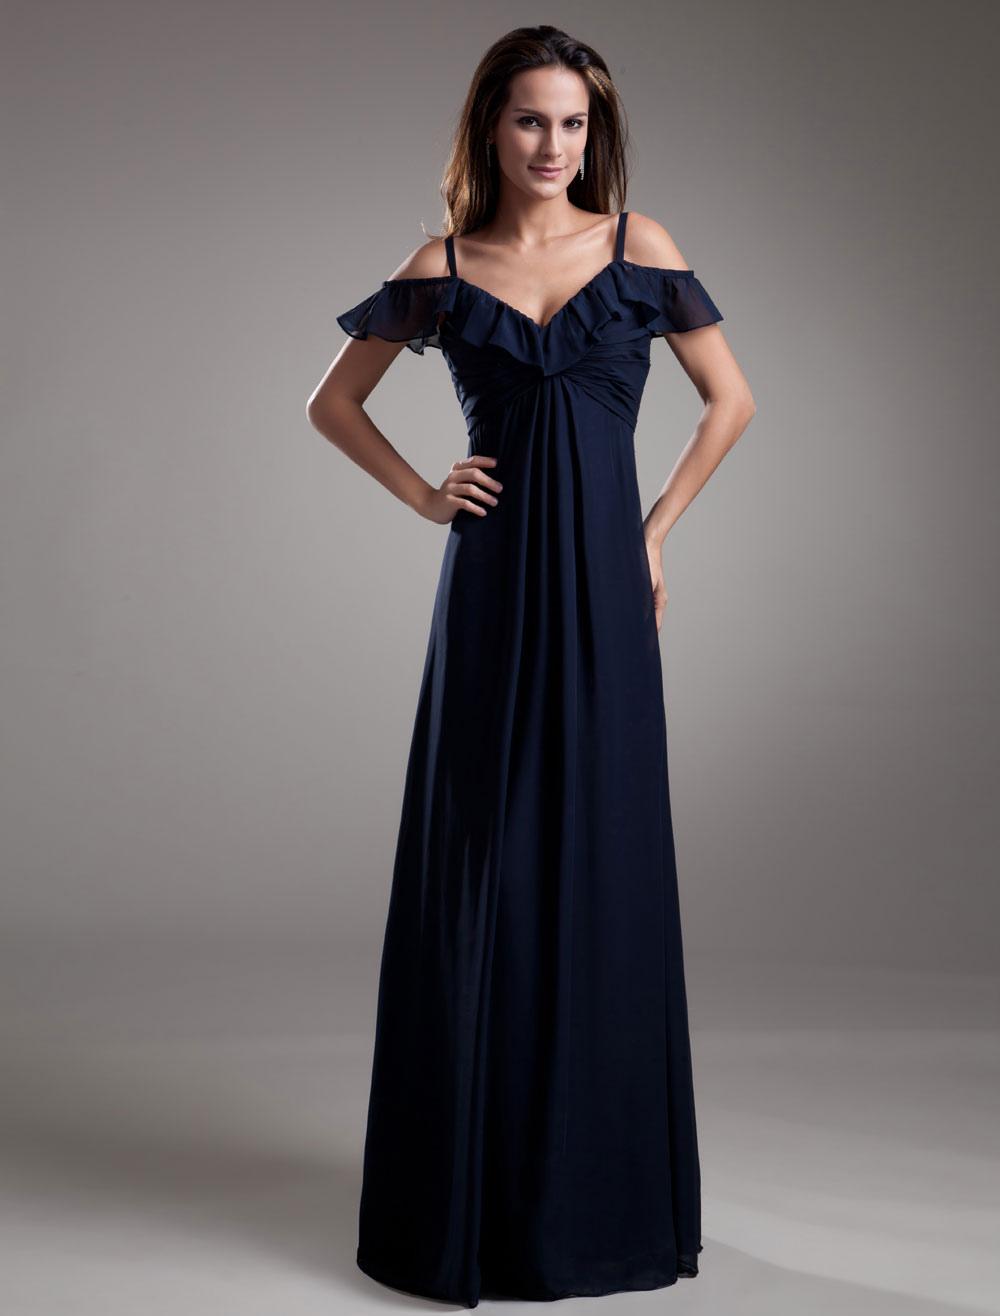 robe de soire en chiffon bleu marine fonc avec volant milanoocom - Milanoo Robe De Soiree Pour Mariage